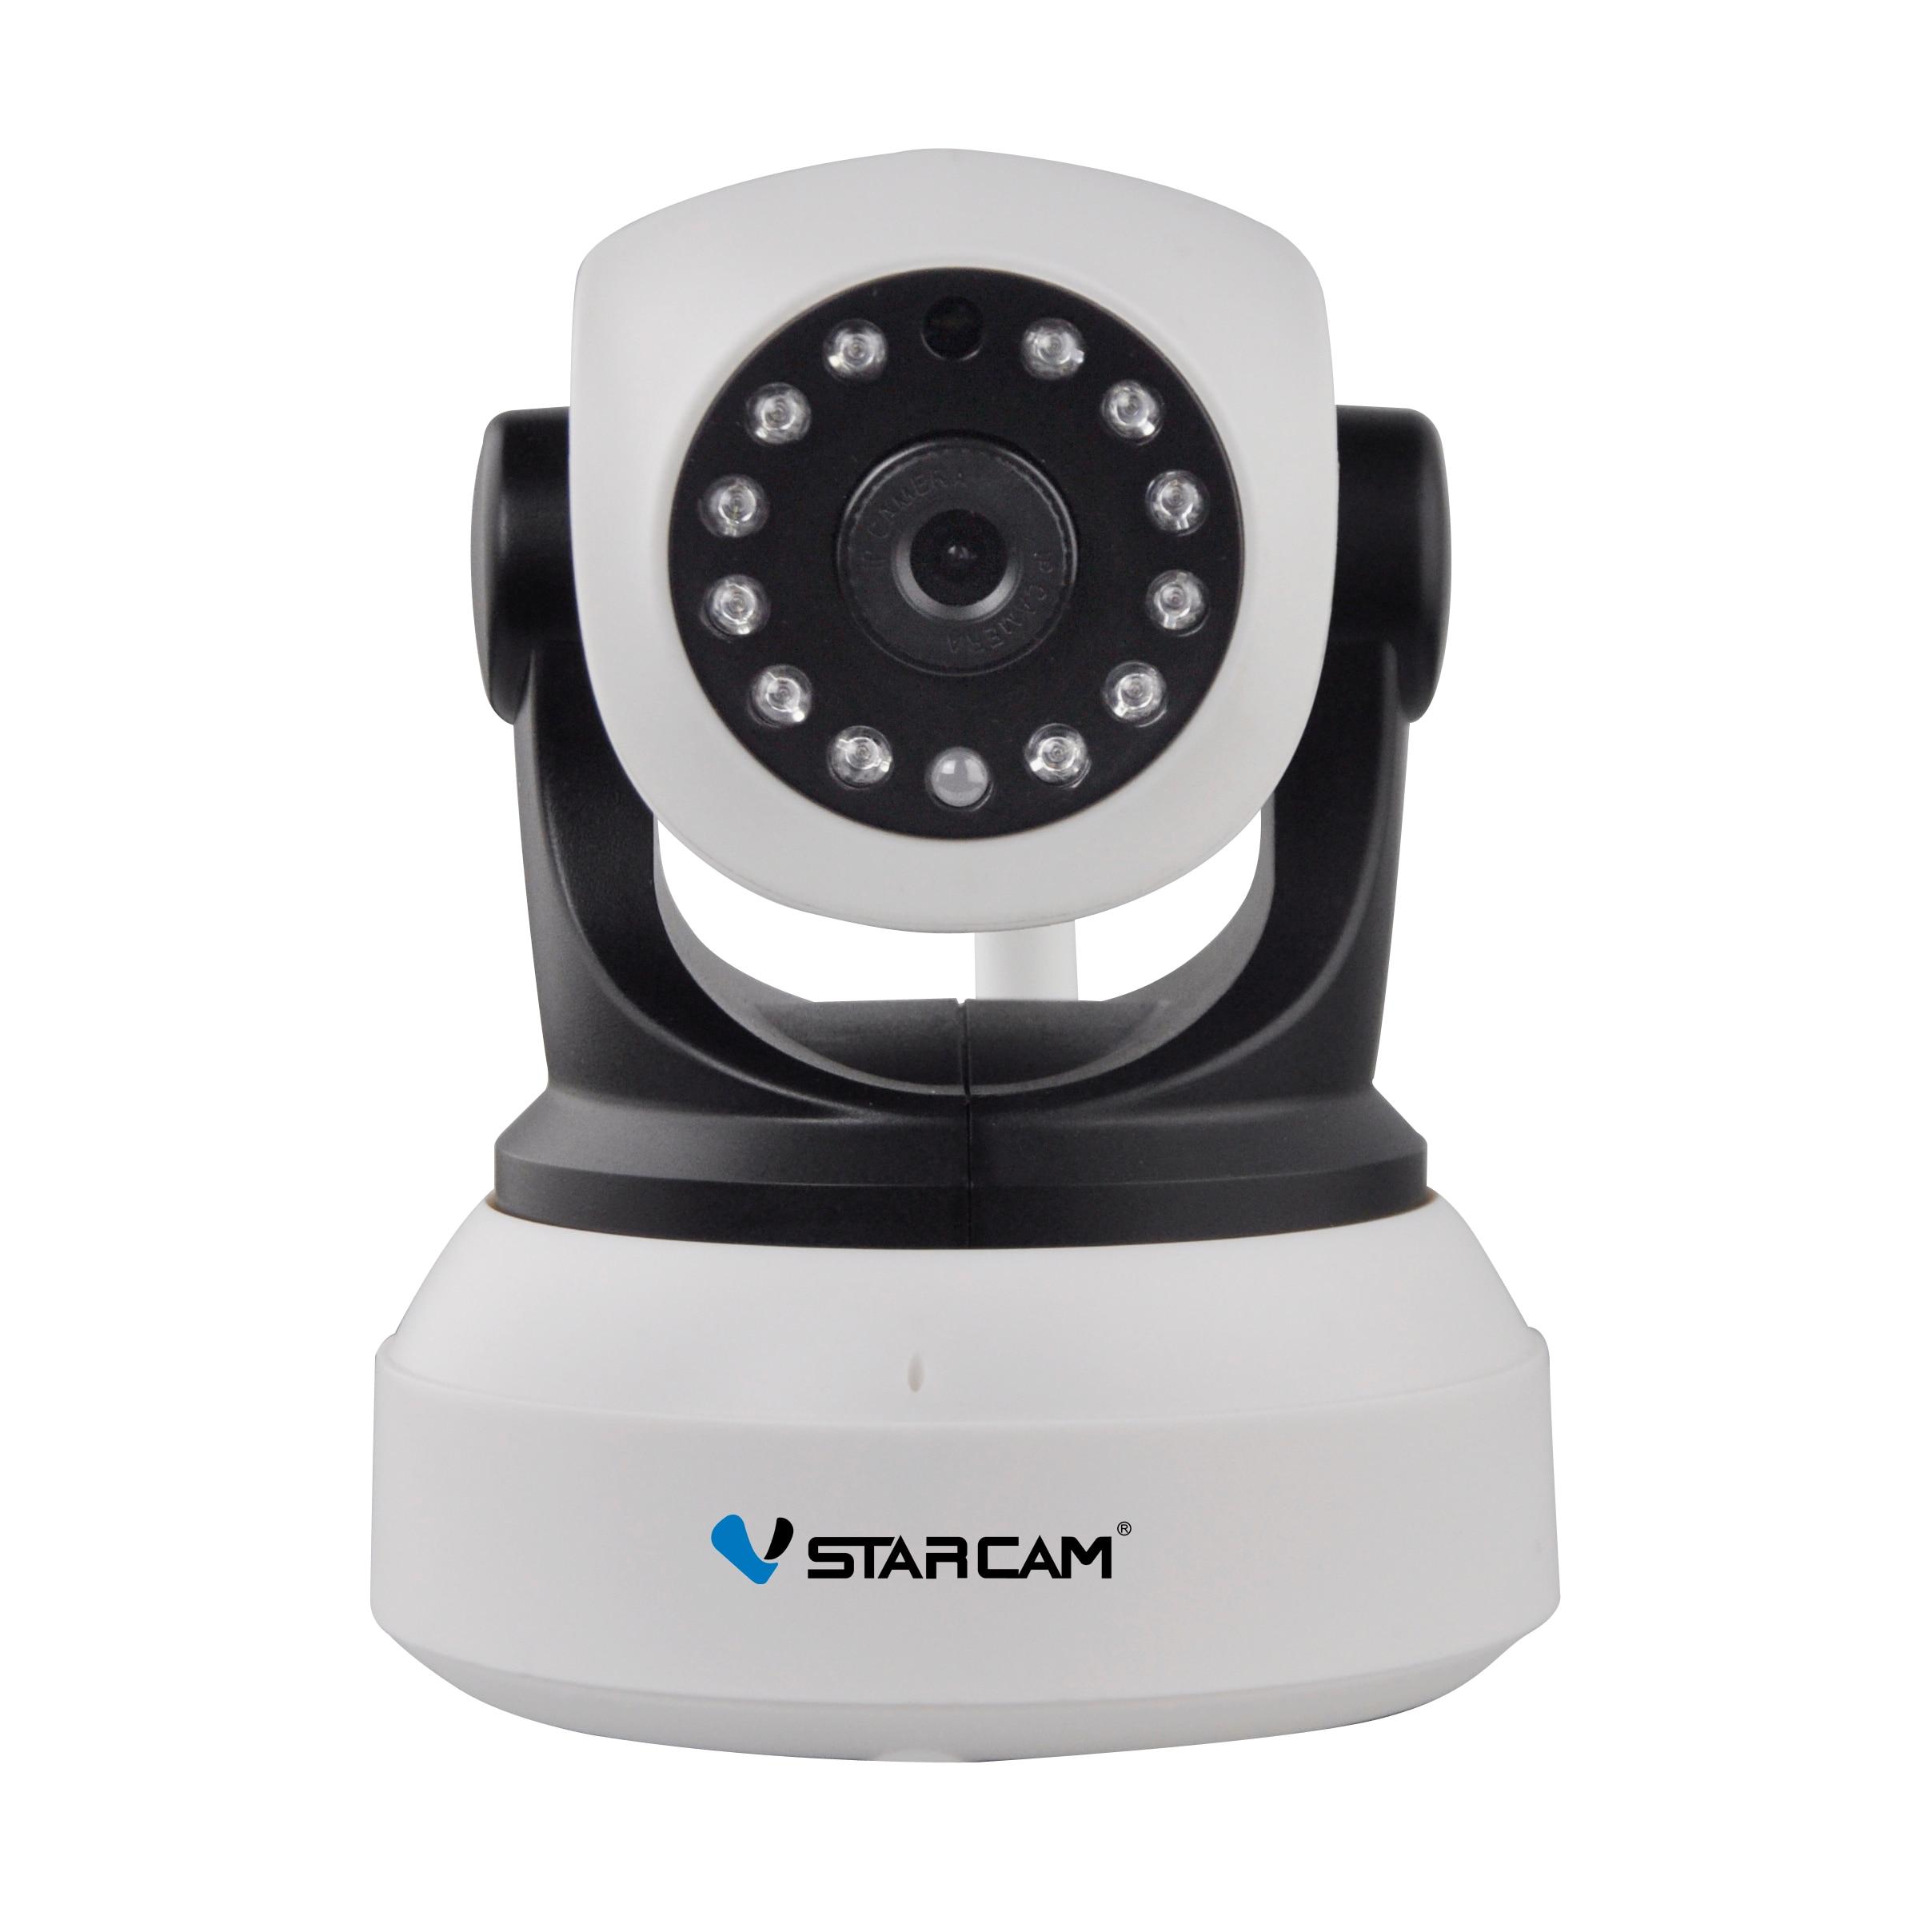 Vstarcam C7824 Wireless IP Camera IR-Cut Night Vision 720p Home Security HD Camera WiFi Audio Recording CCTV Onvif Indoor sacam 720p wifi wireless ip camera with two way audio ir cut night vision video onvif p2p network webcam for home security alarm